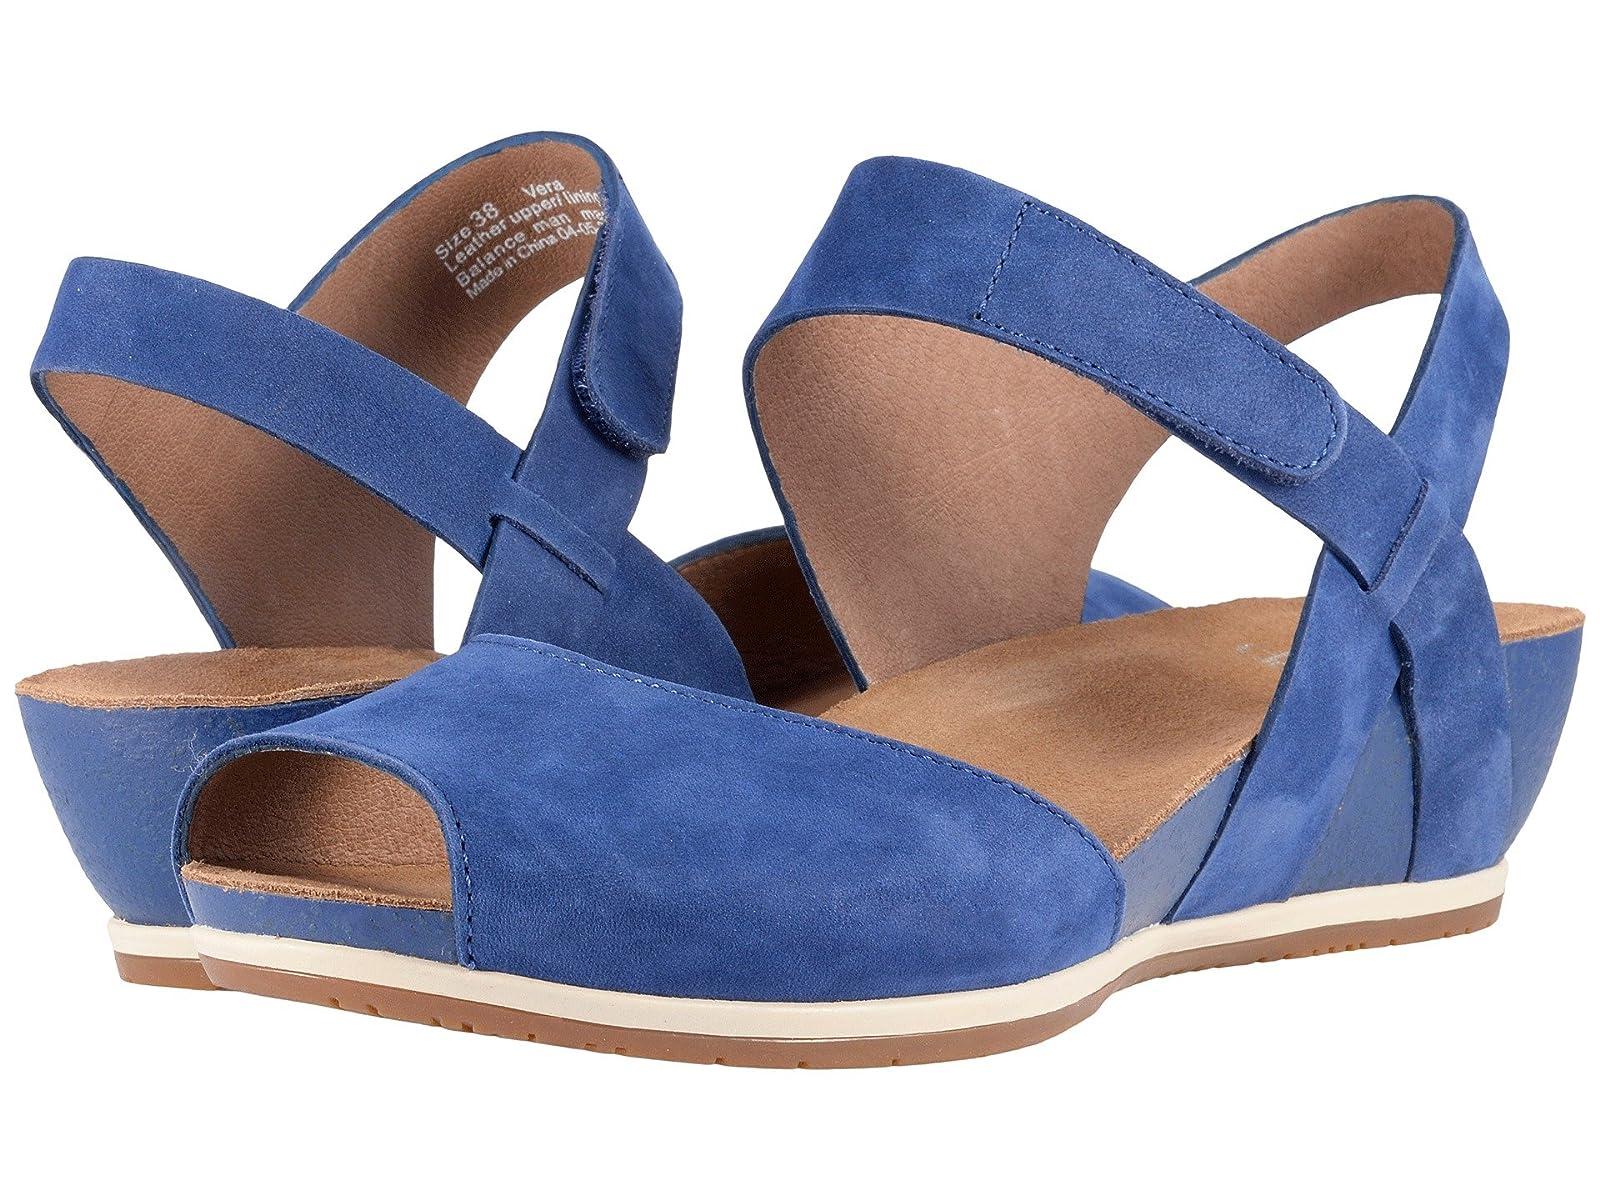 Dansko VeraComfortable and distinctive shoes